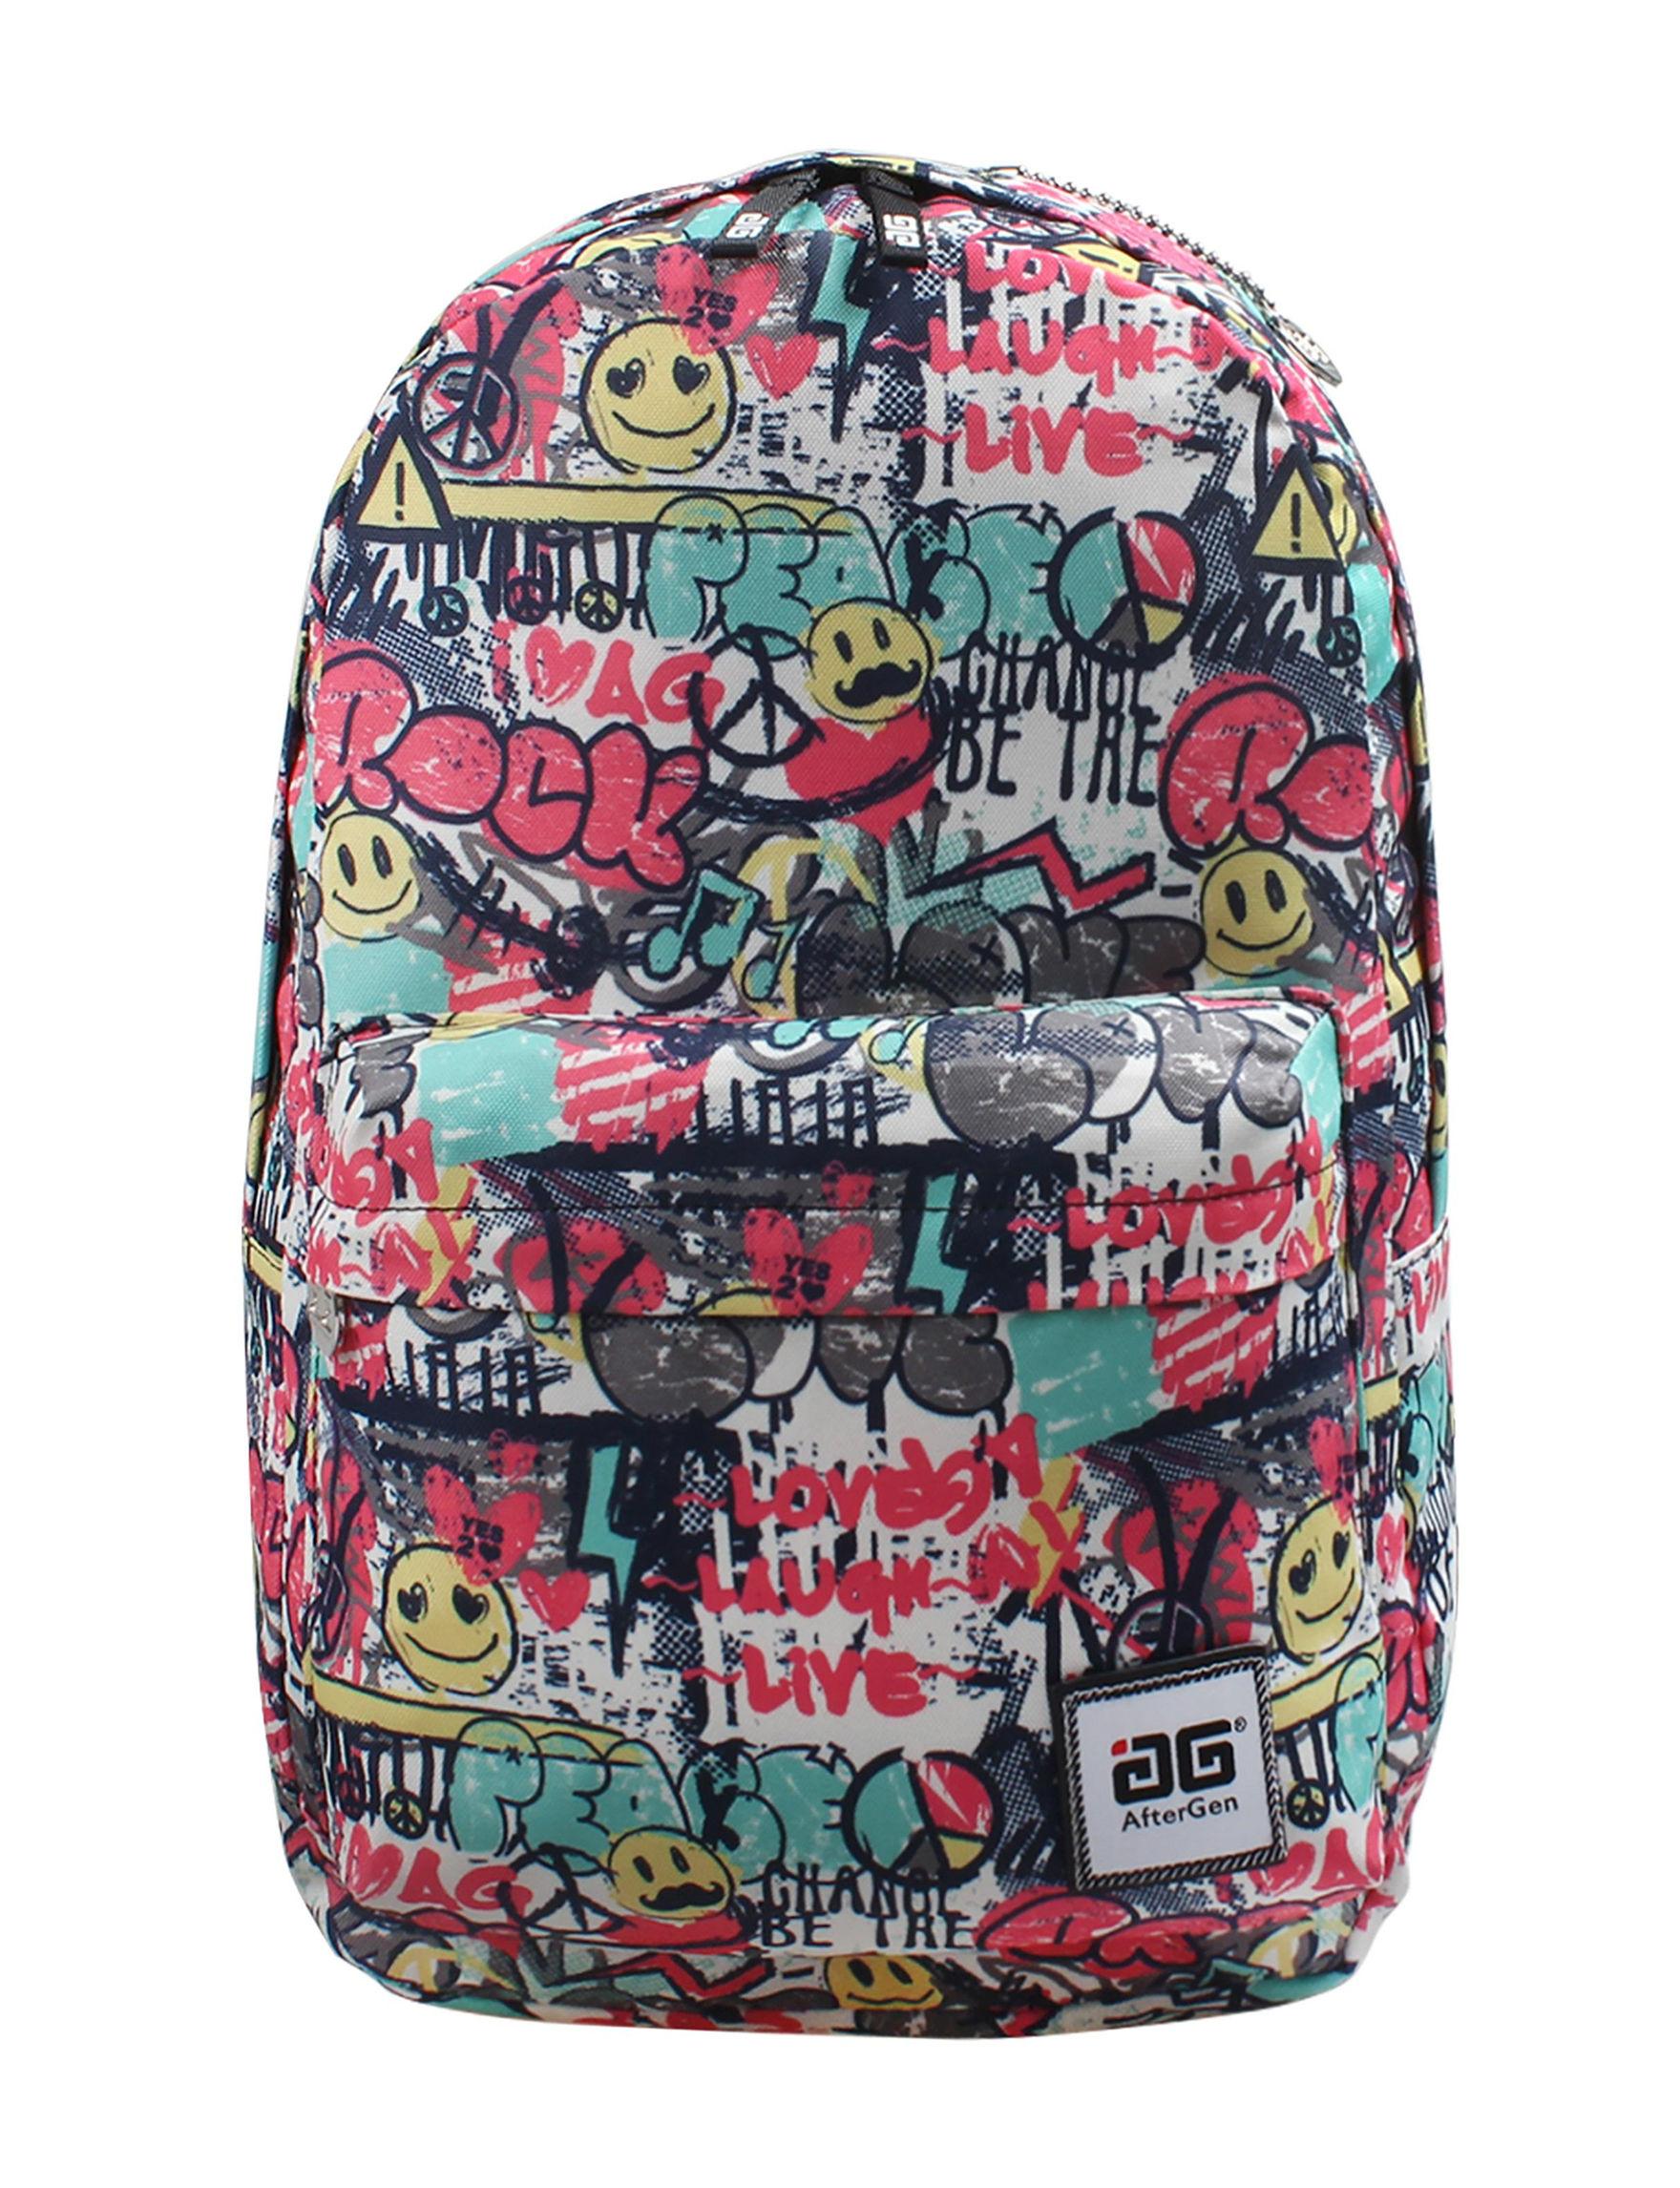 Aftergen Pink Multi Bookbags & Backpacks